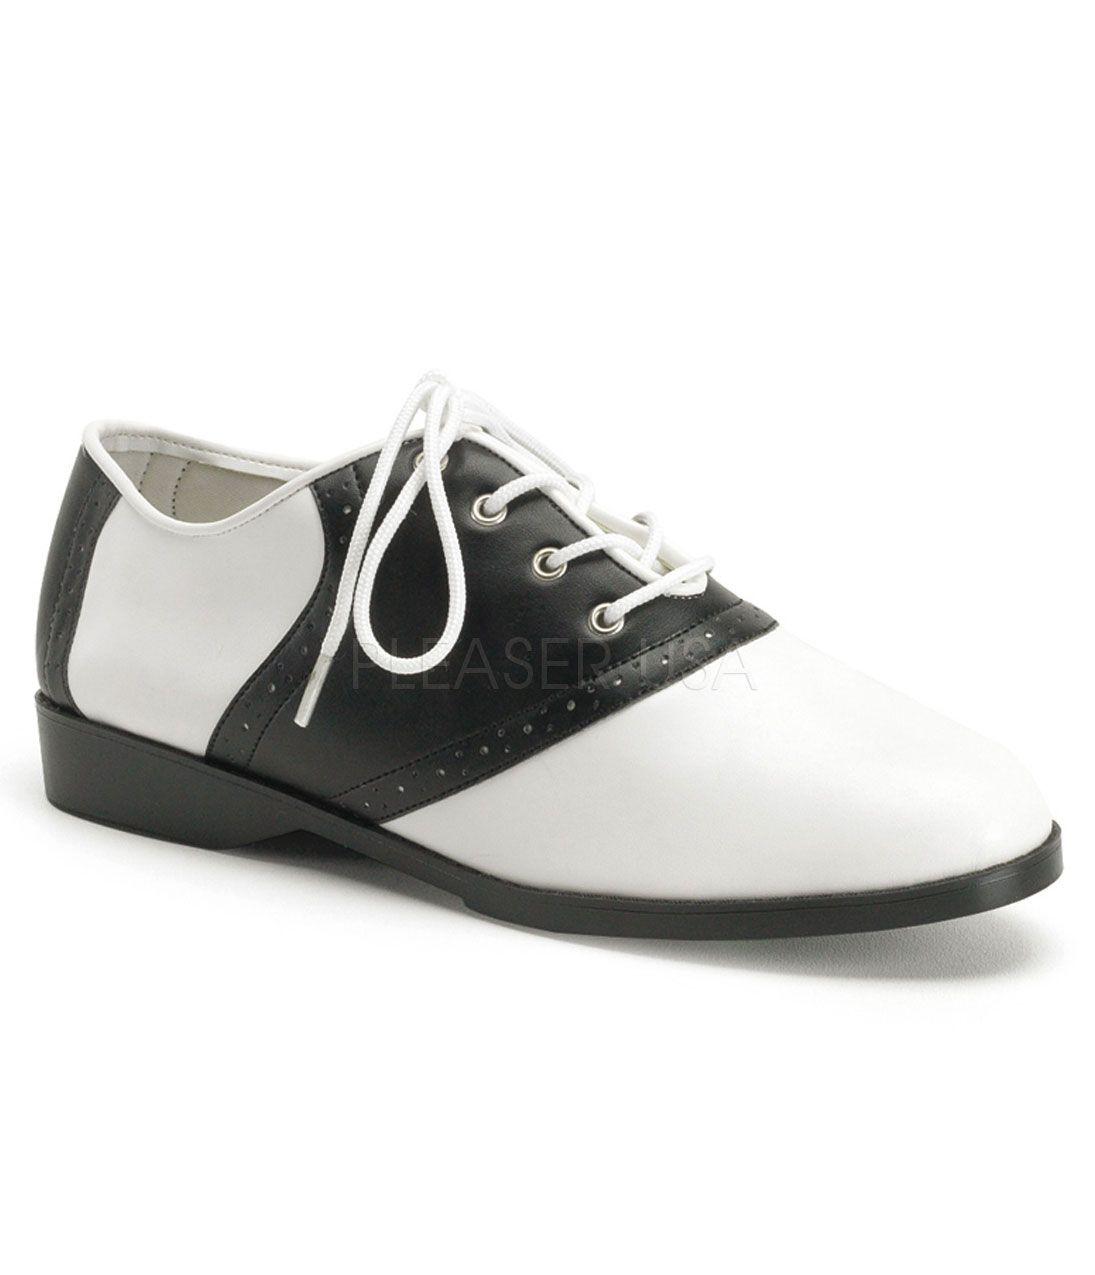 cd6cd54efca8c1 Retro Saddle Shoes  Black   White